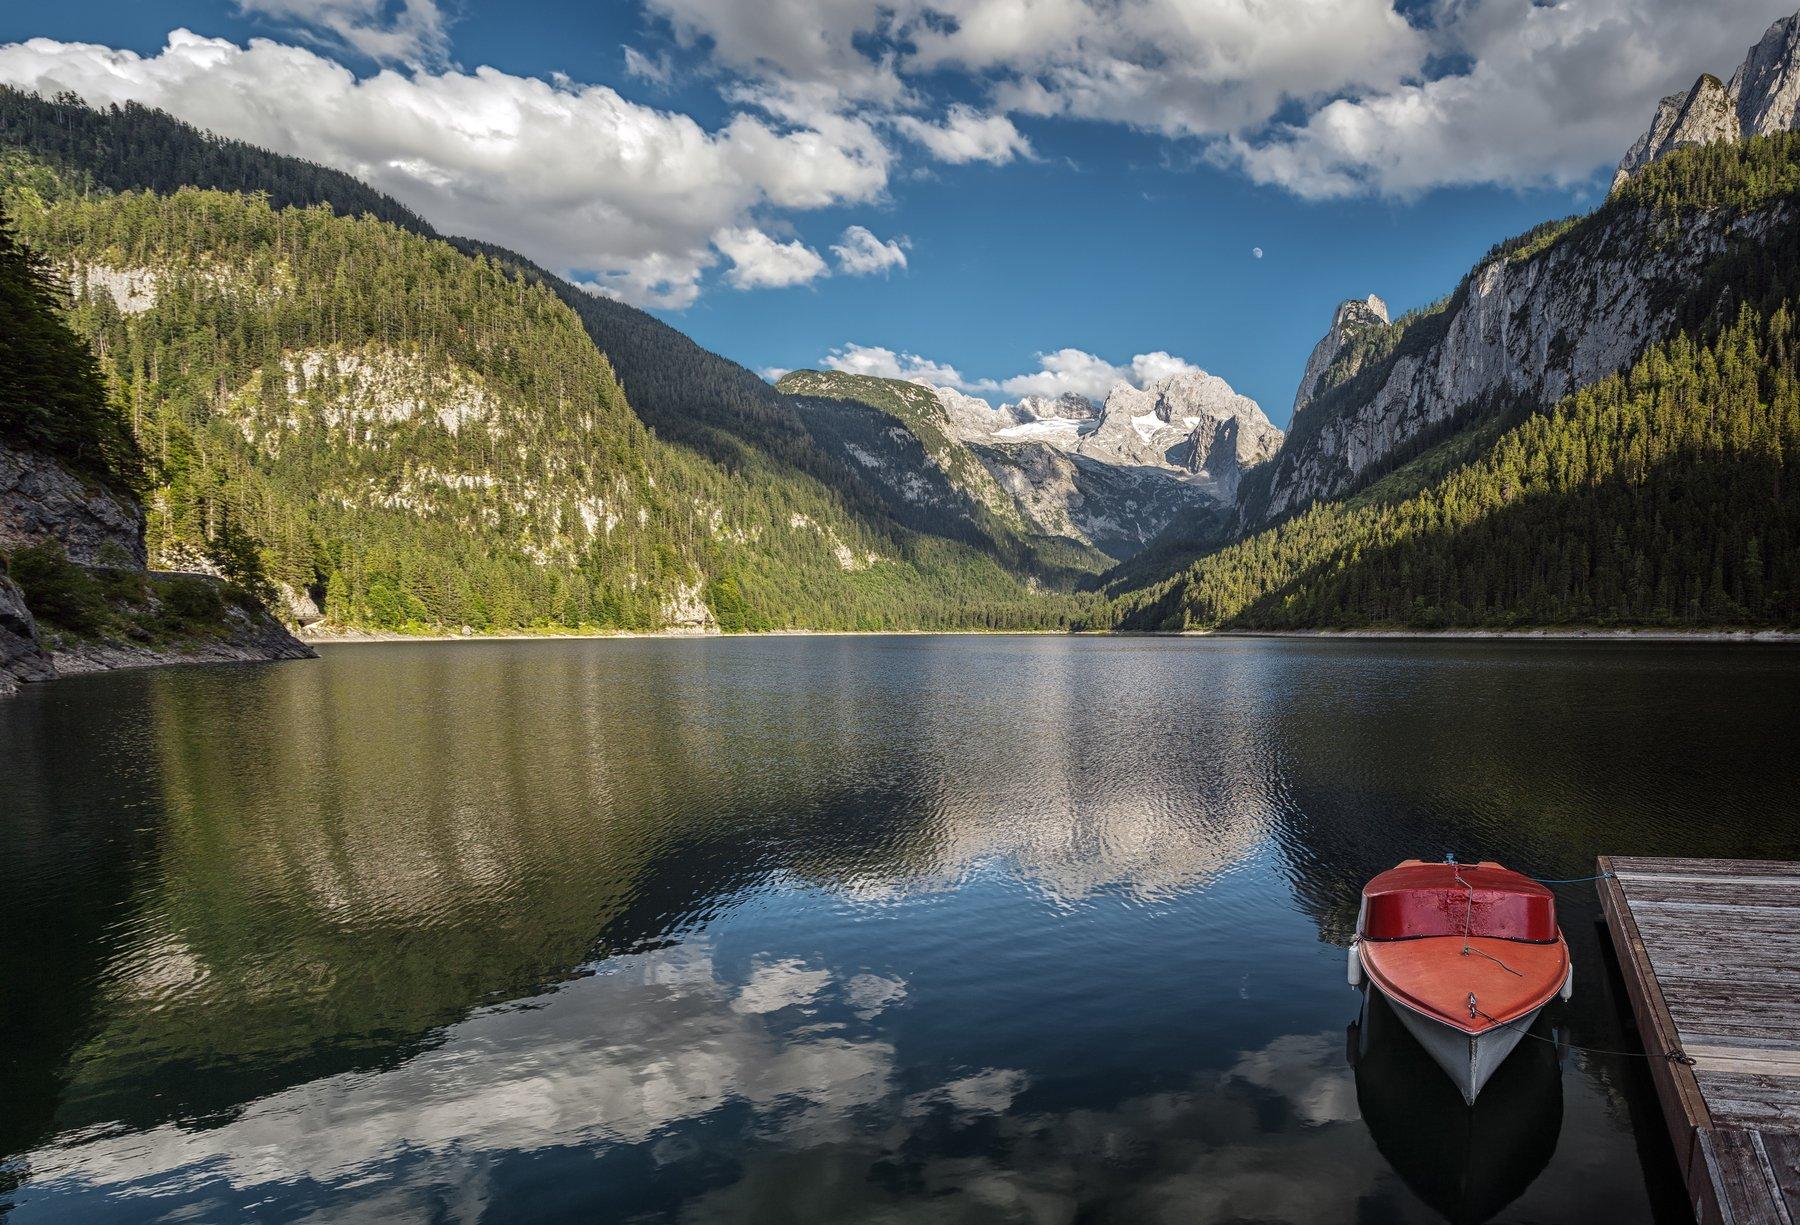 озеро, горы, альпы, Alexandr Bezmolitvenny